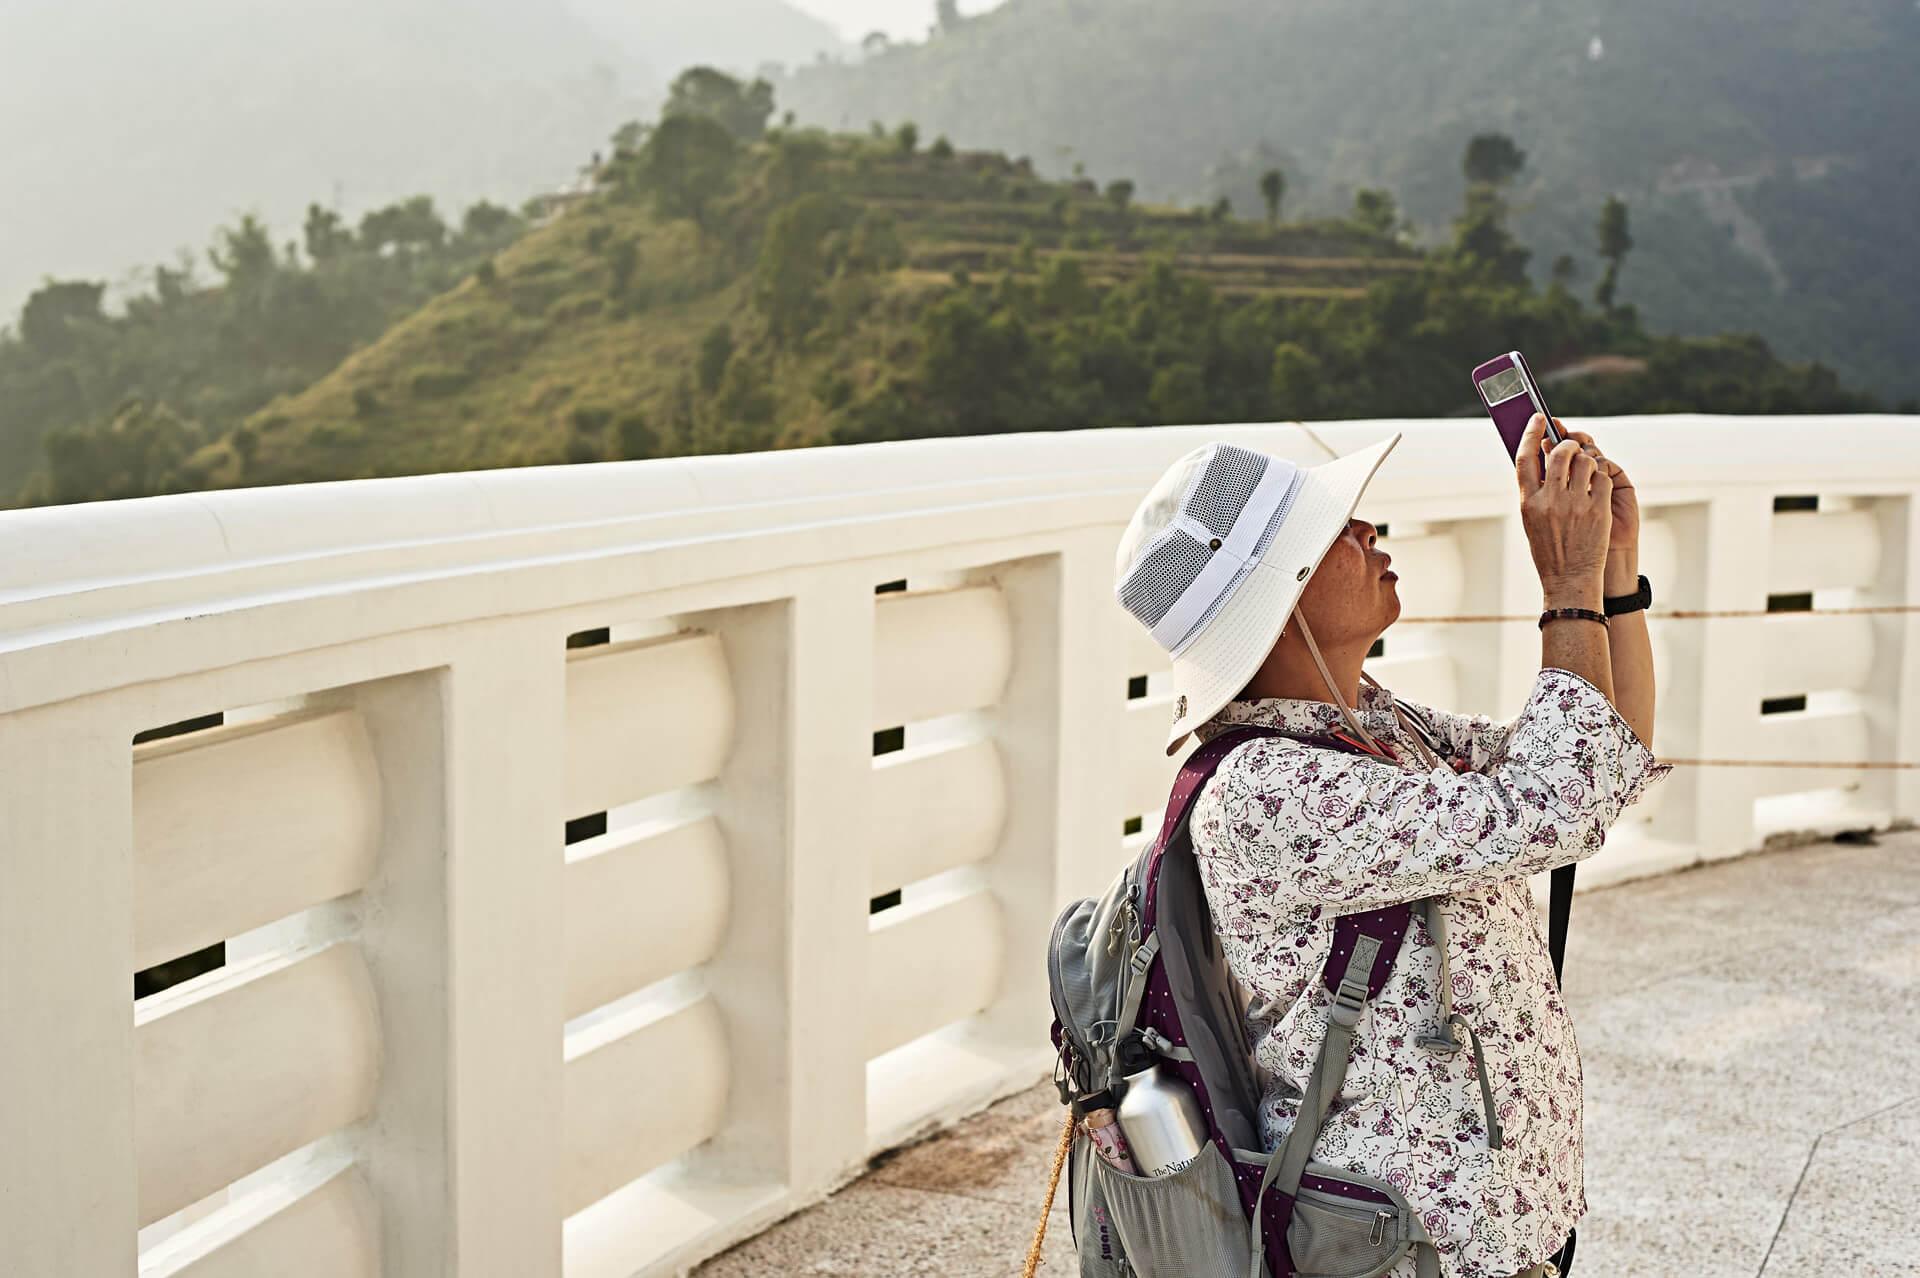 nepal_pokhara_20131029_0212-Kopie